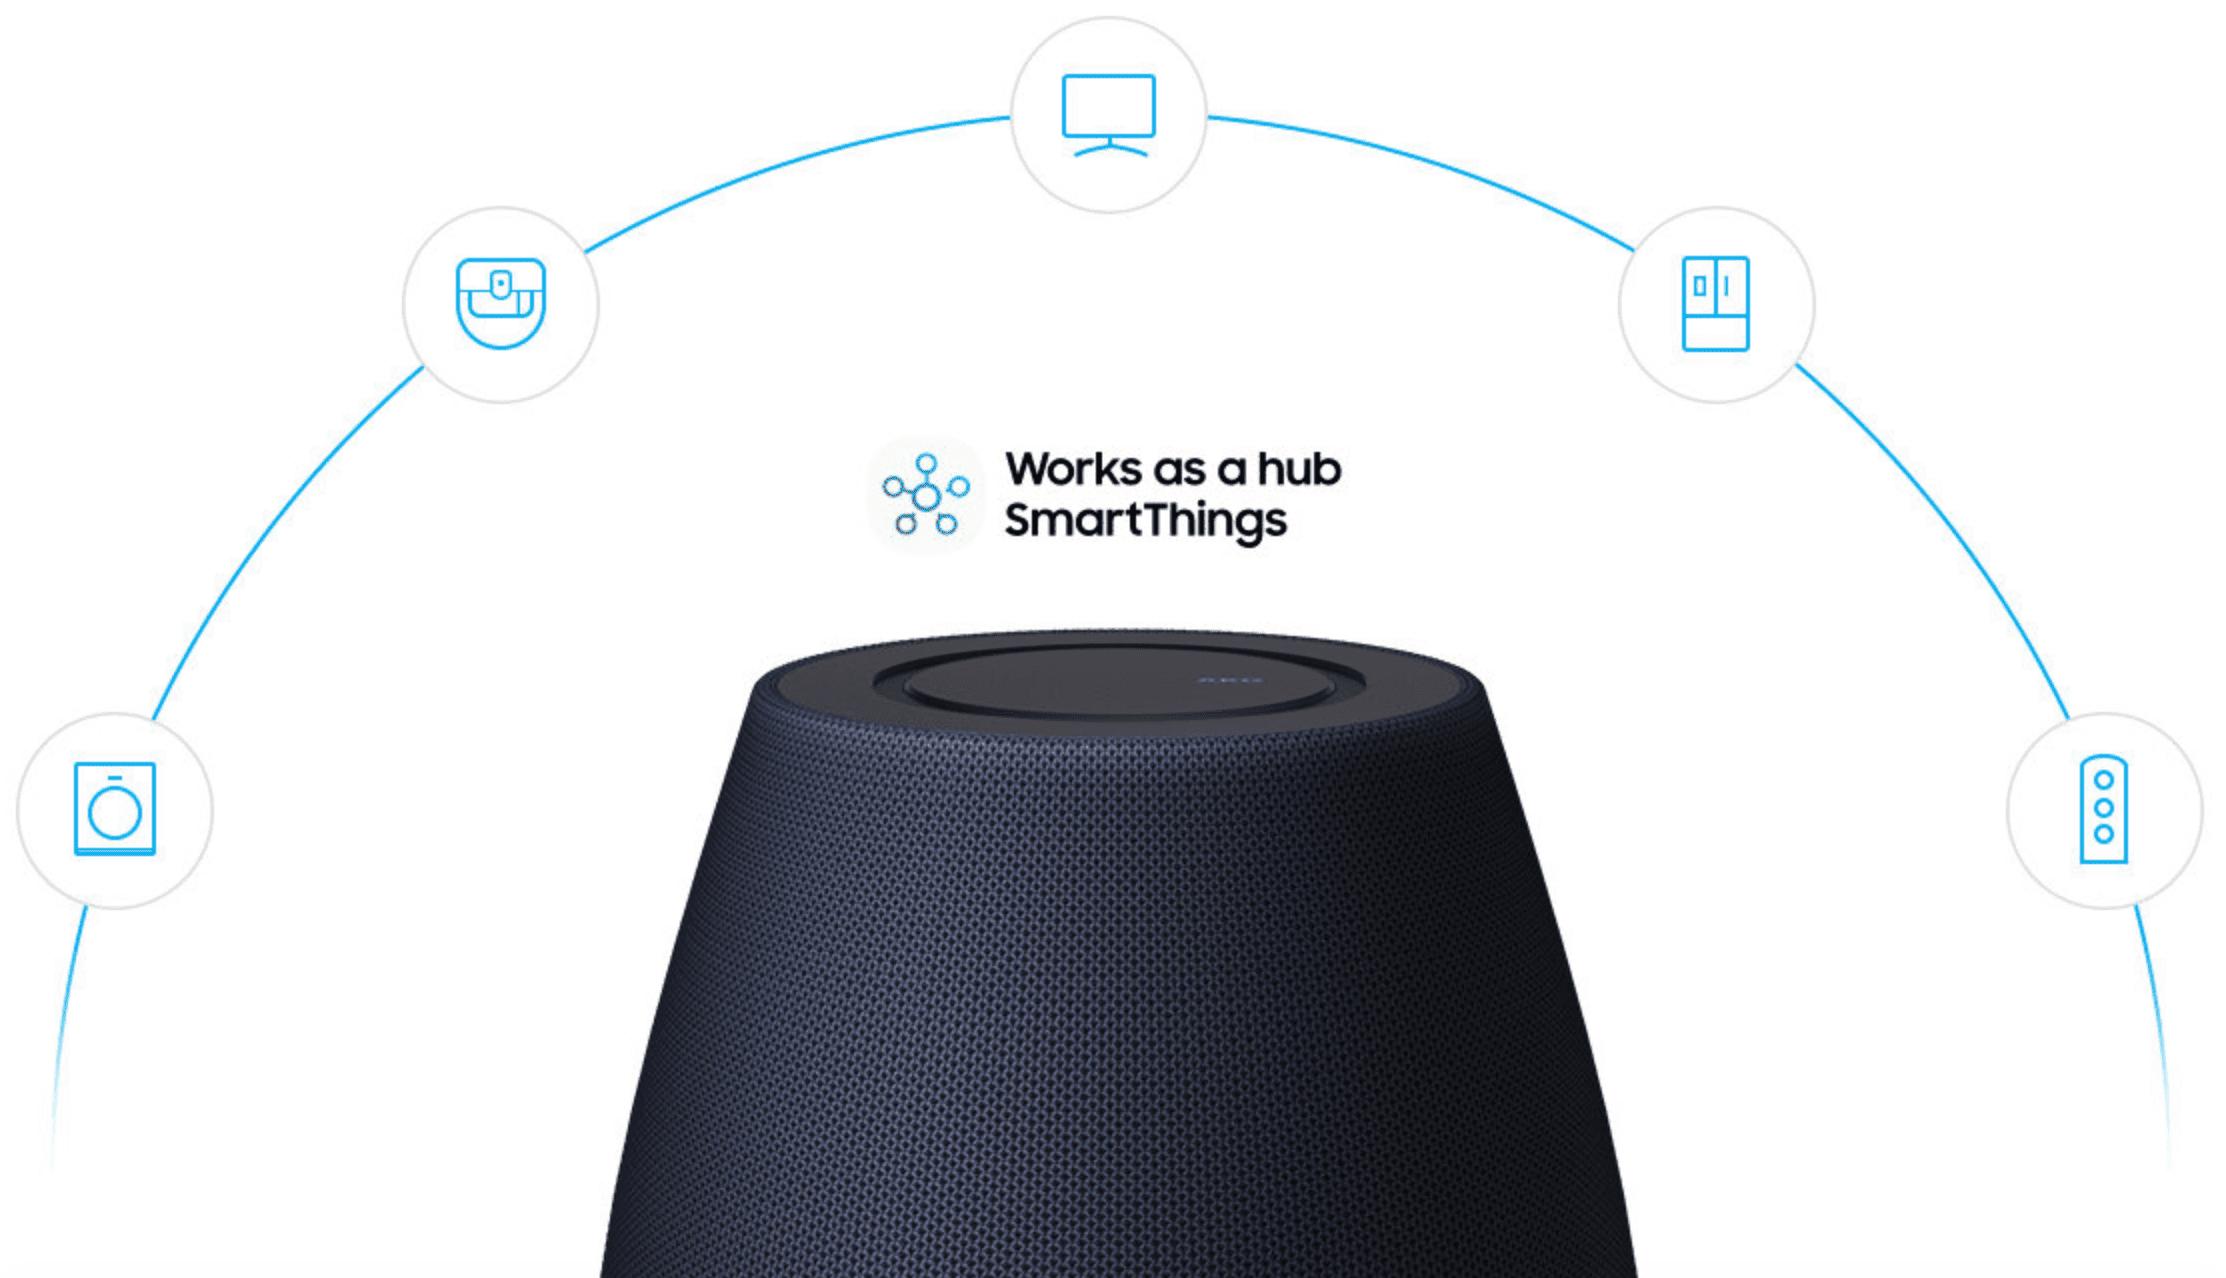 Galaxy Home as a SmartThings hub